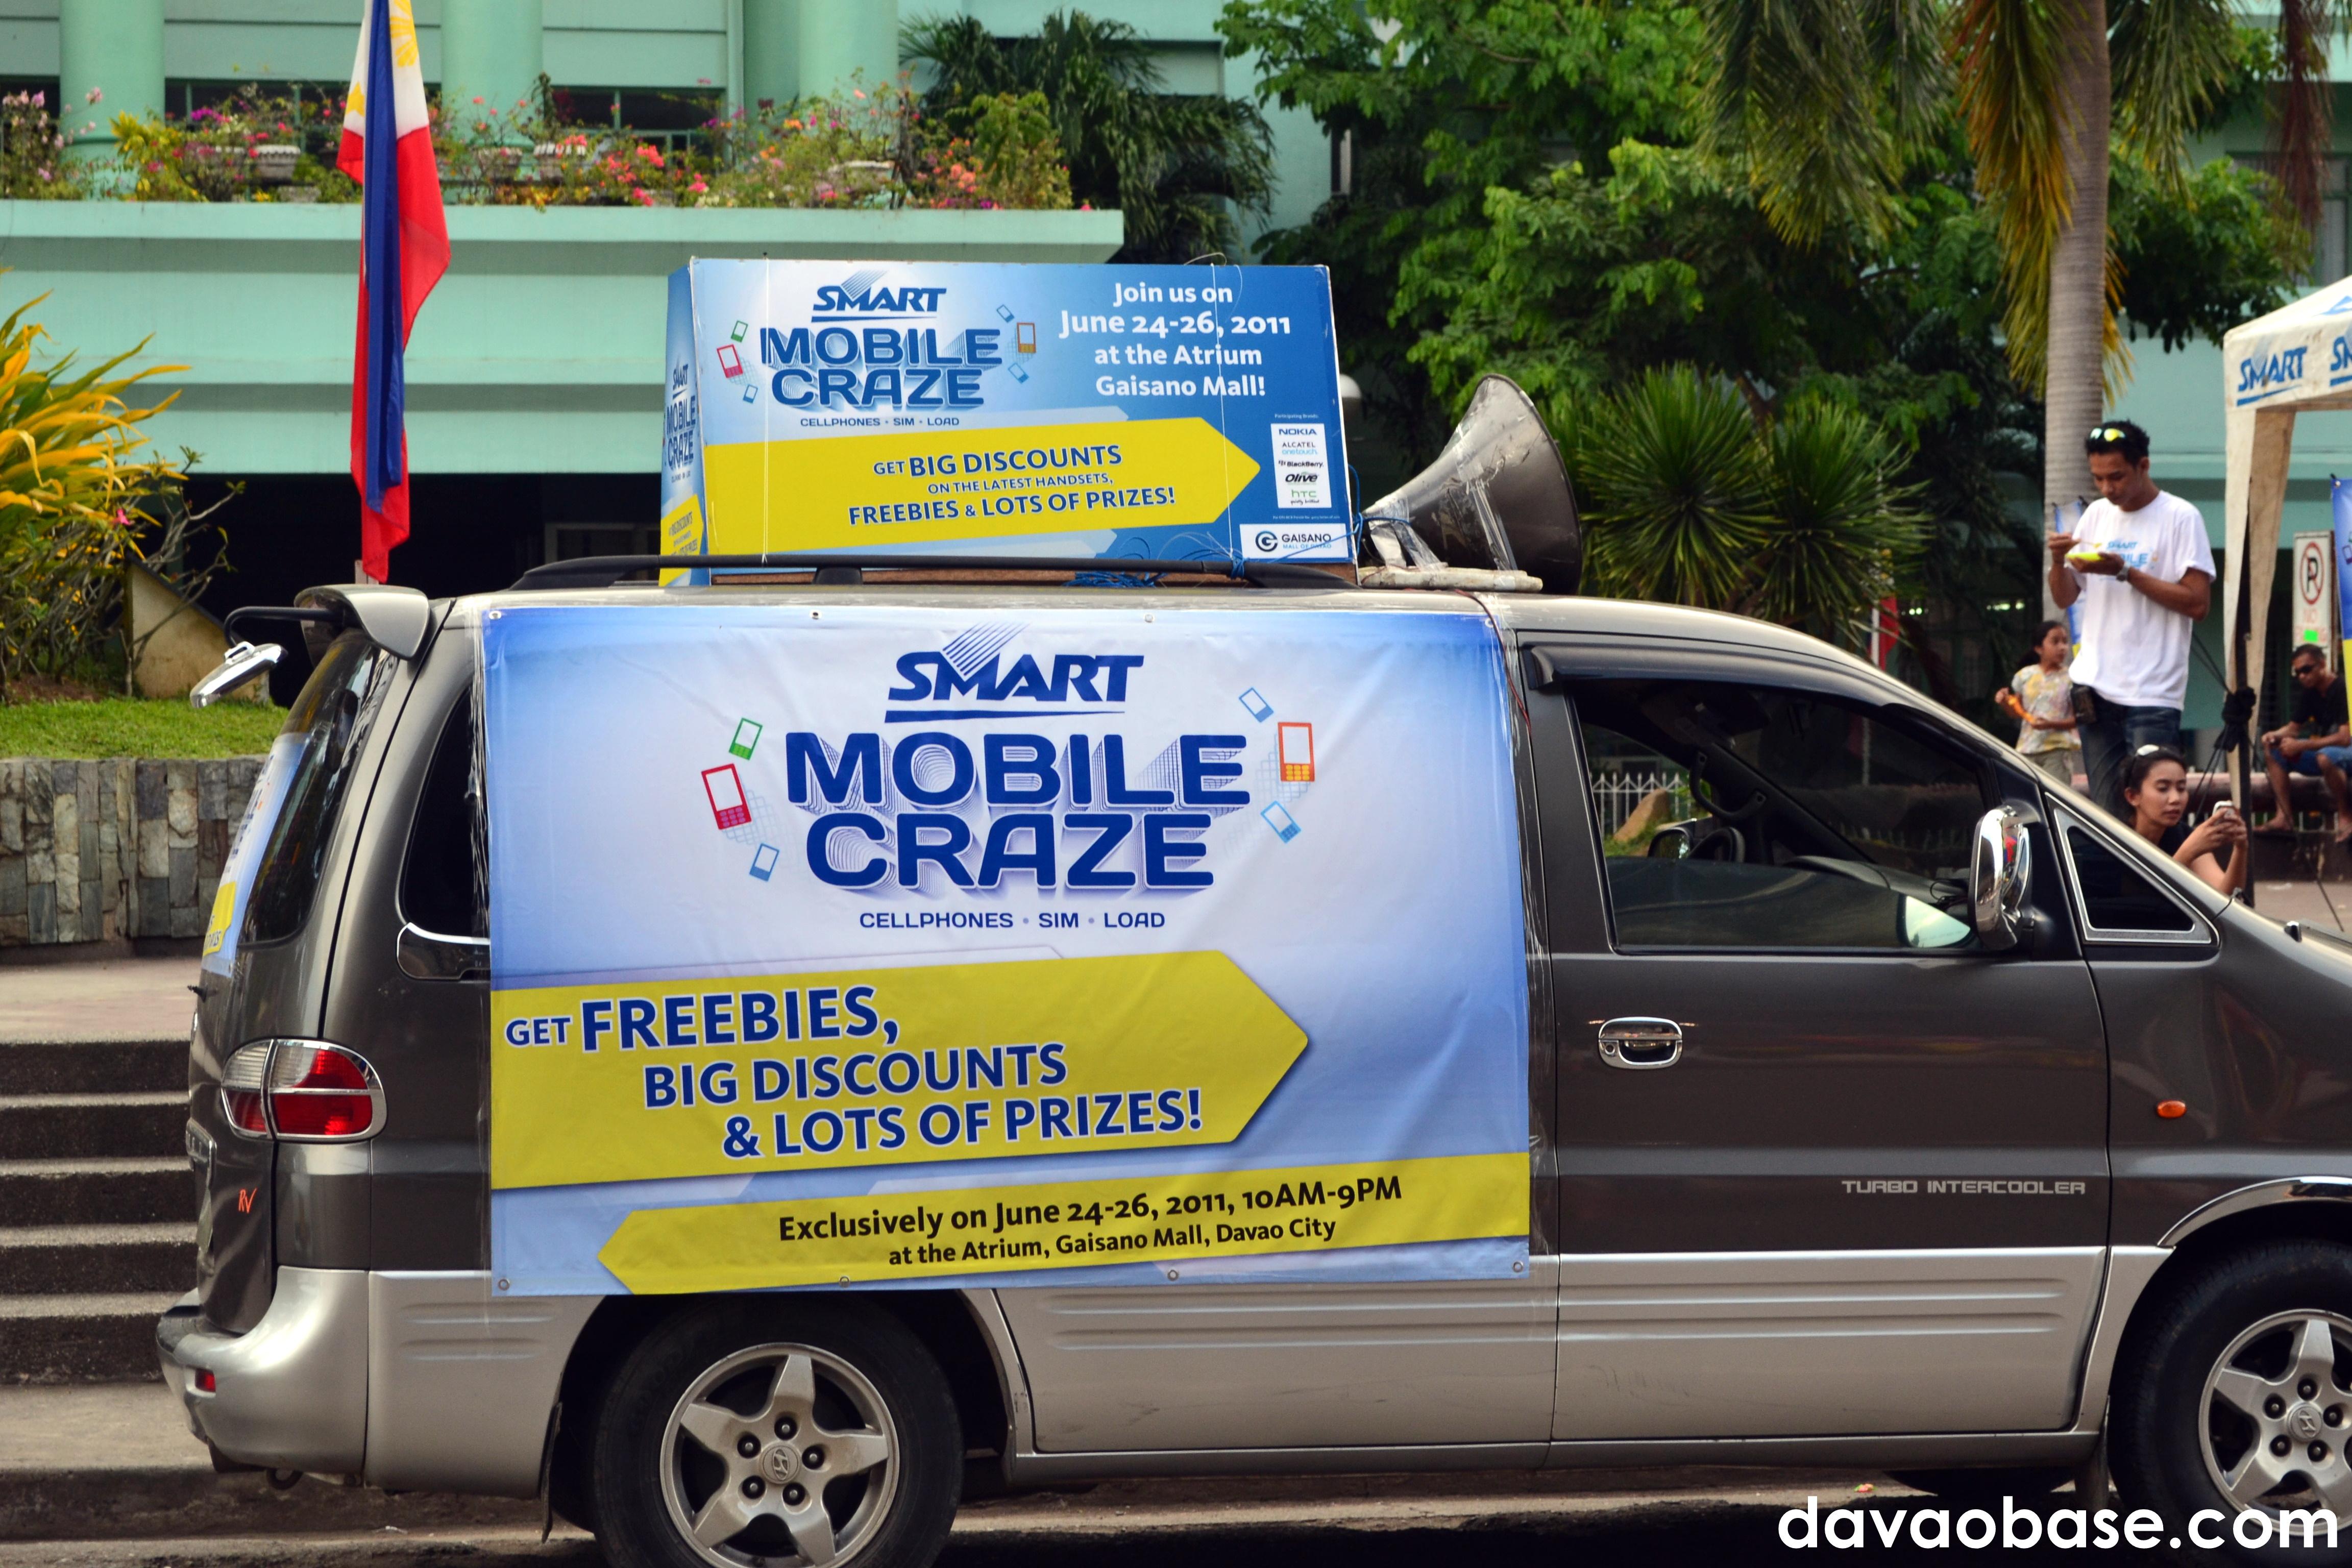 SMART Mobile Craze, as seen on a van near San Pedro Church